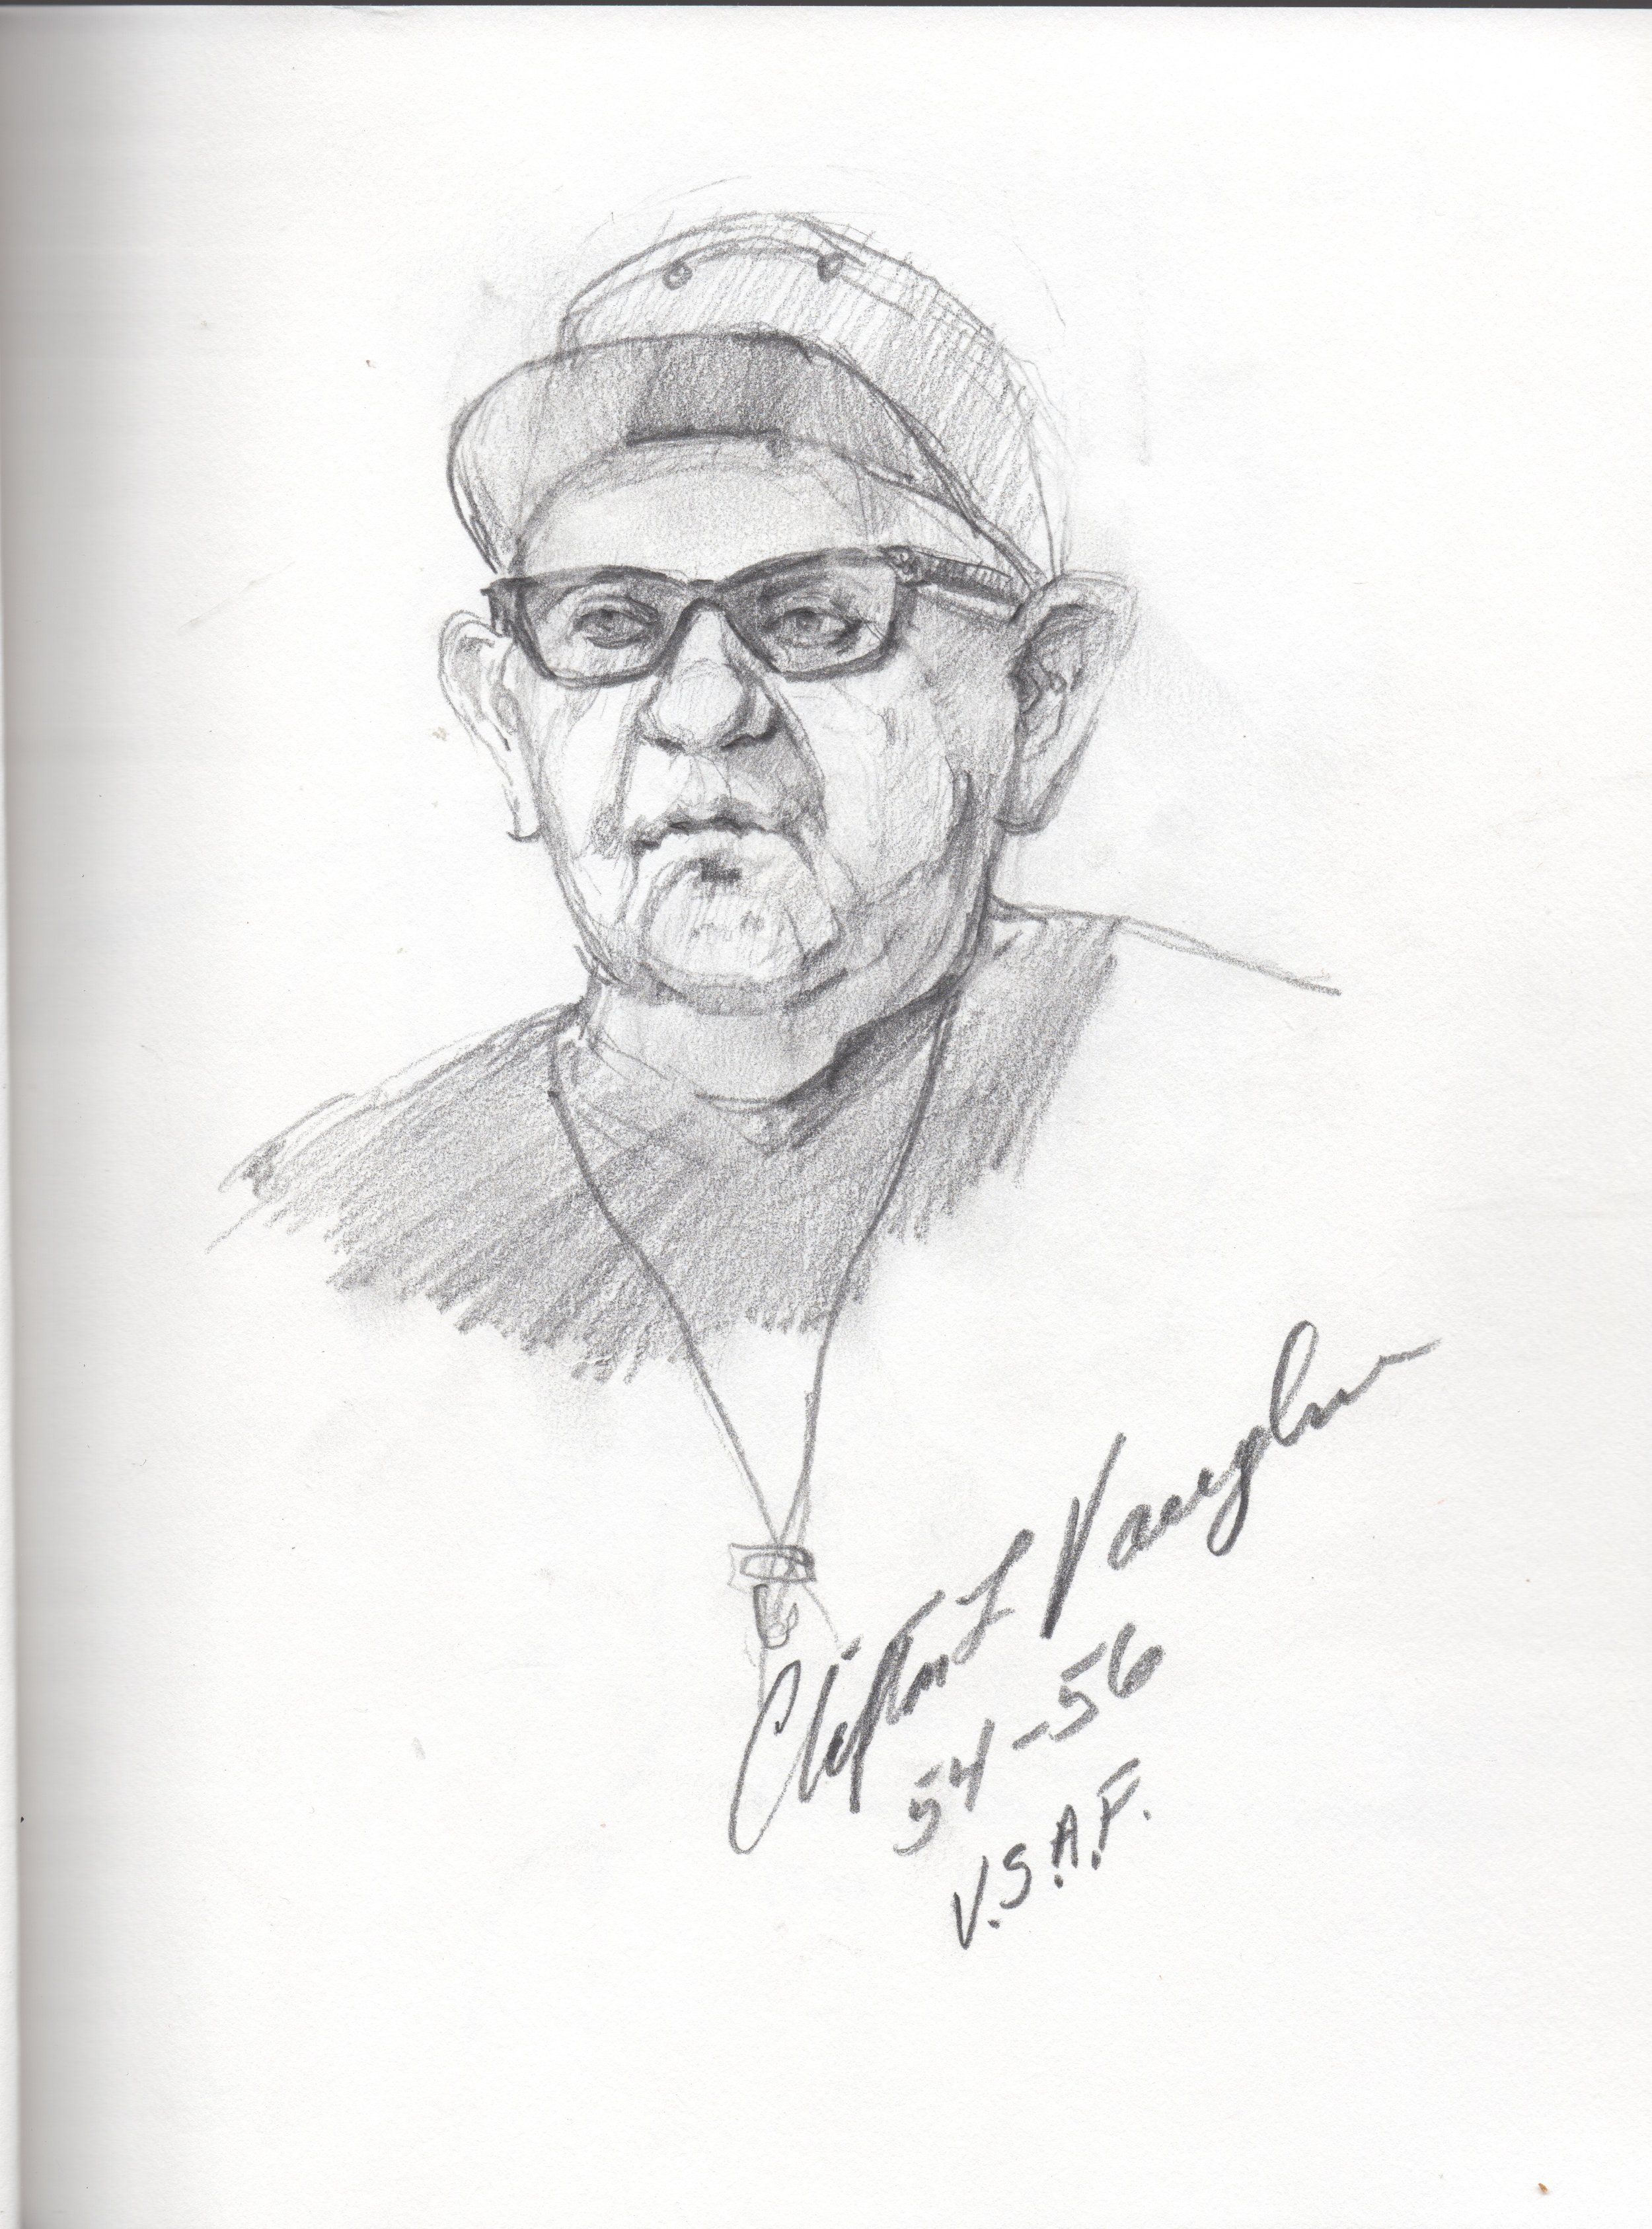 Clifton Vaughn